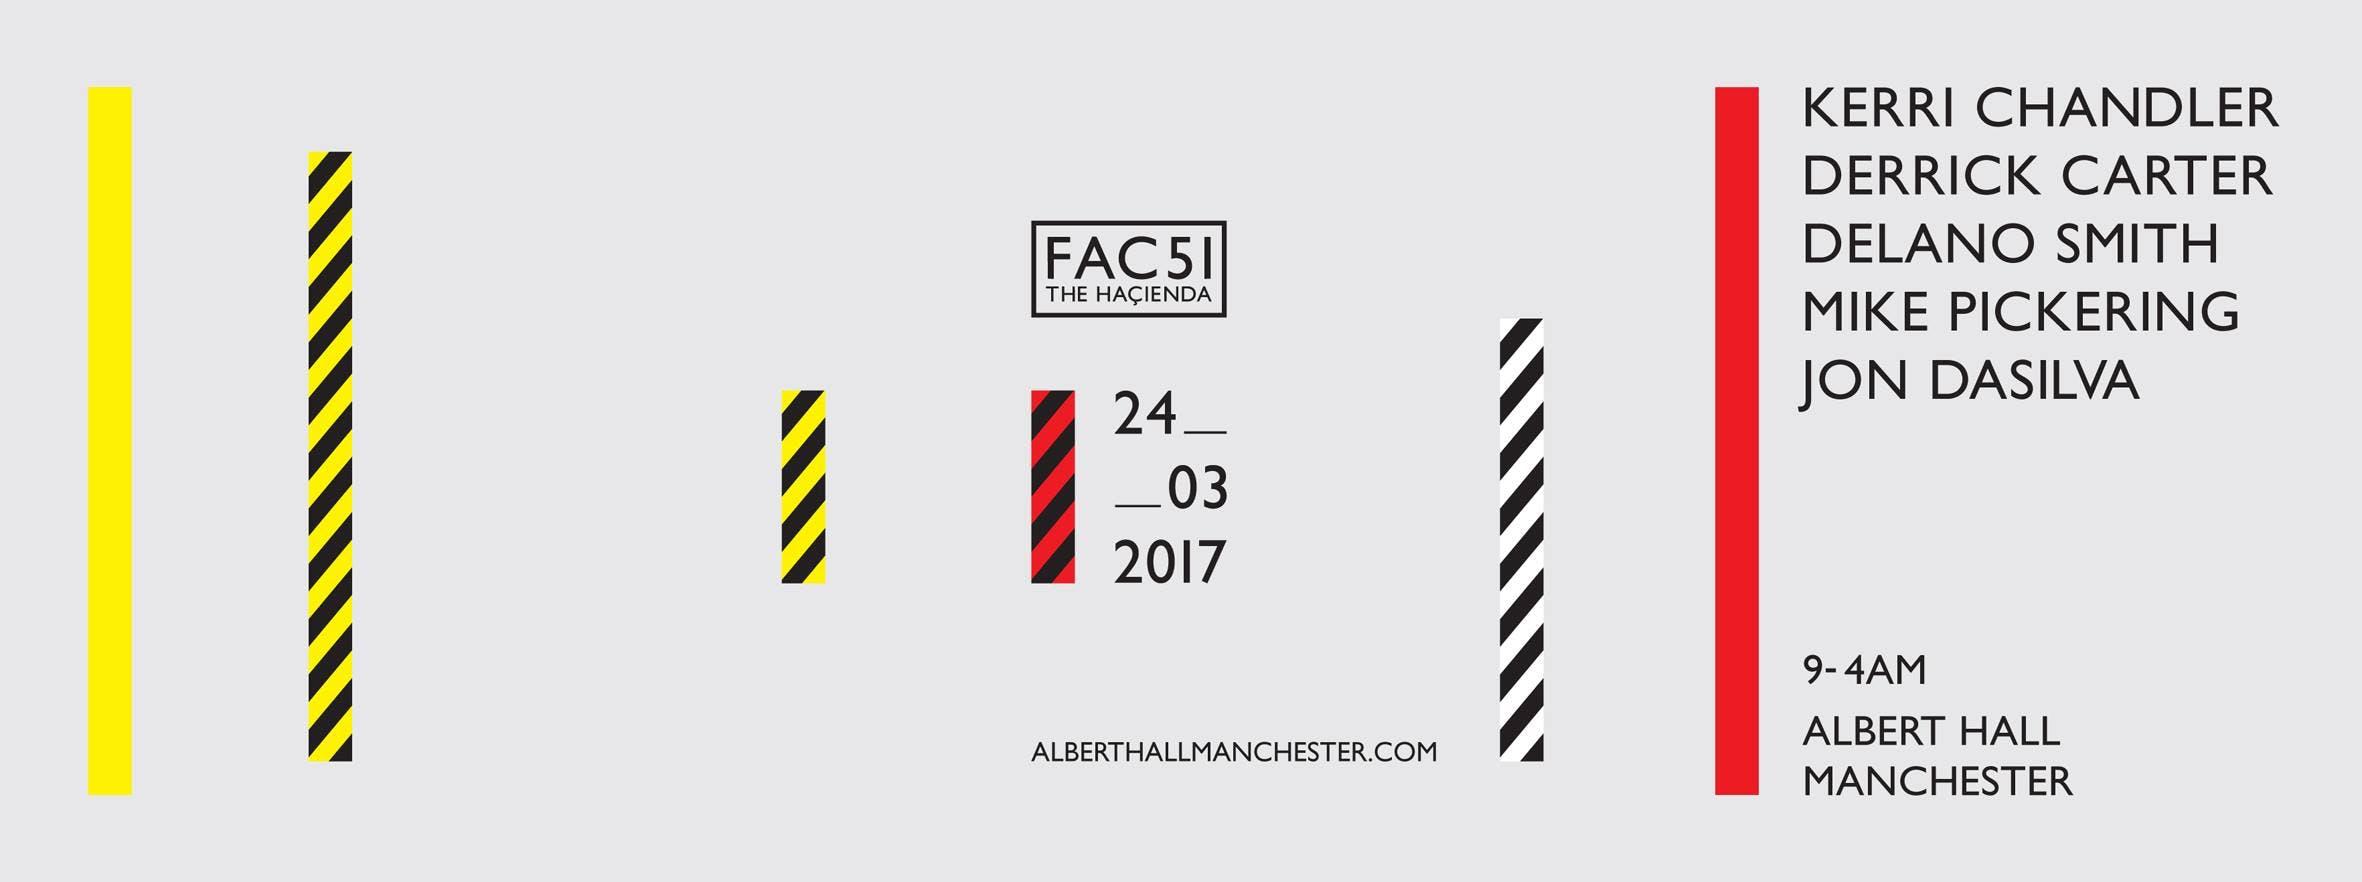 FAC51 THE HAÇIENDA – ALBERT HALL MCR